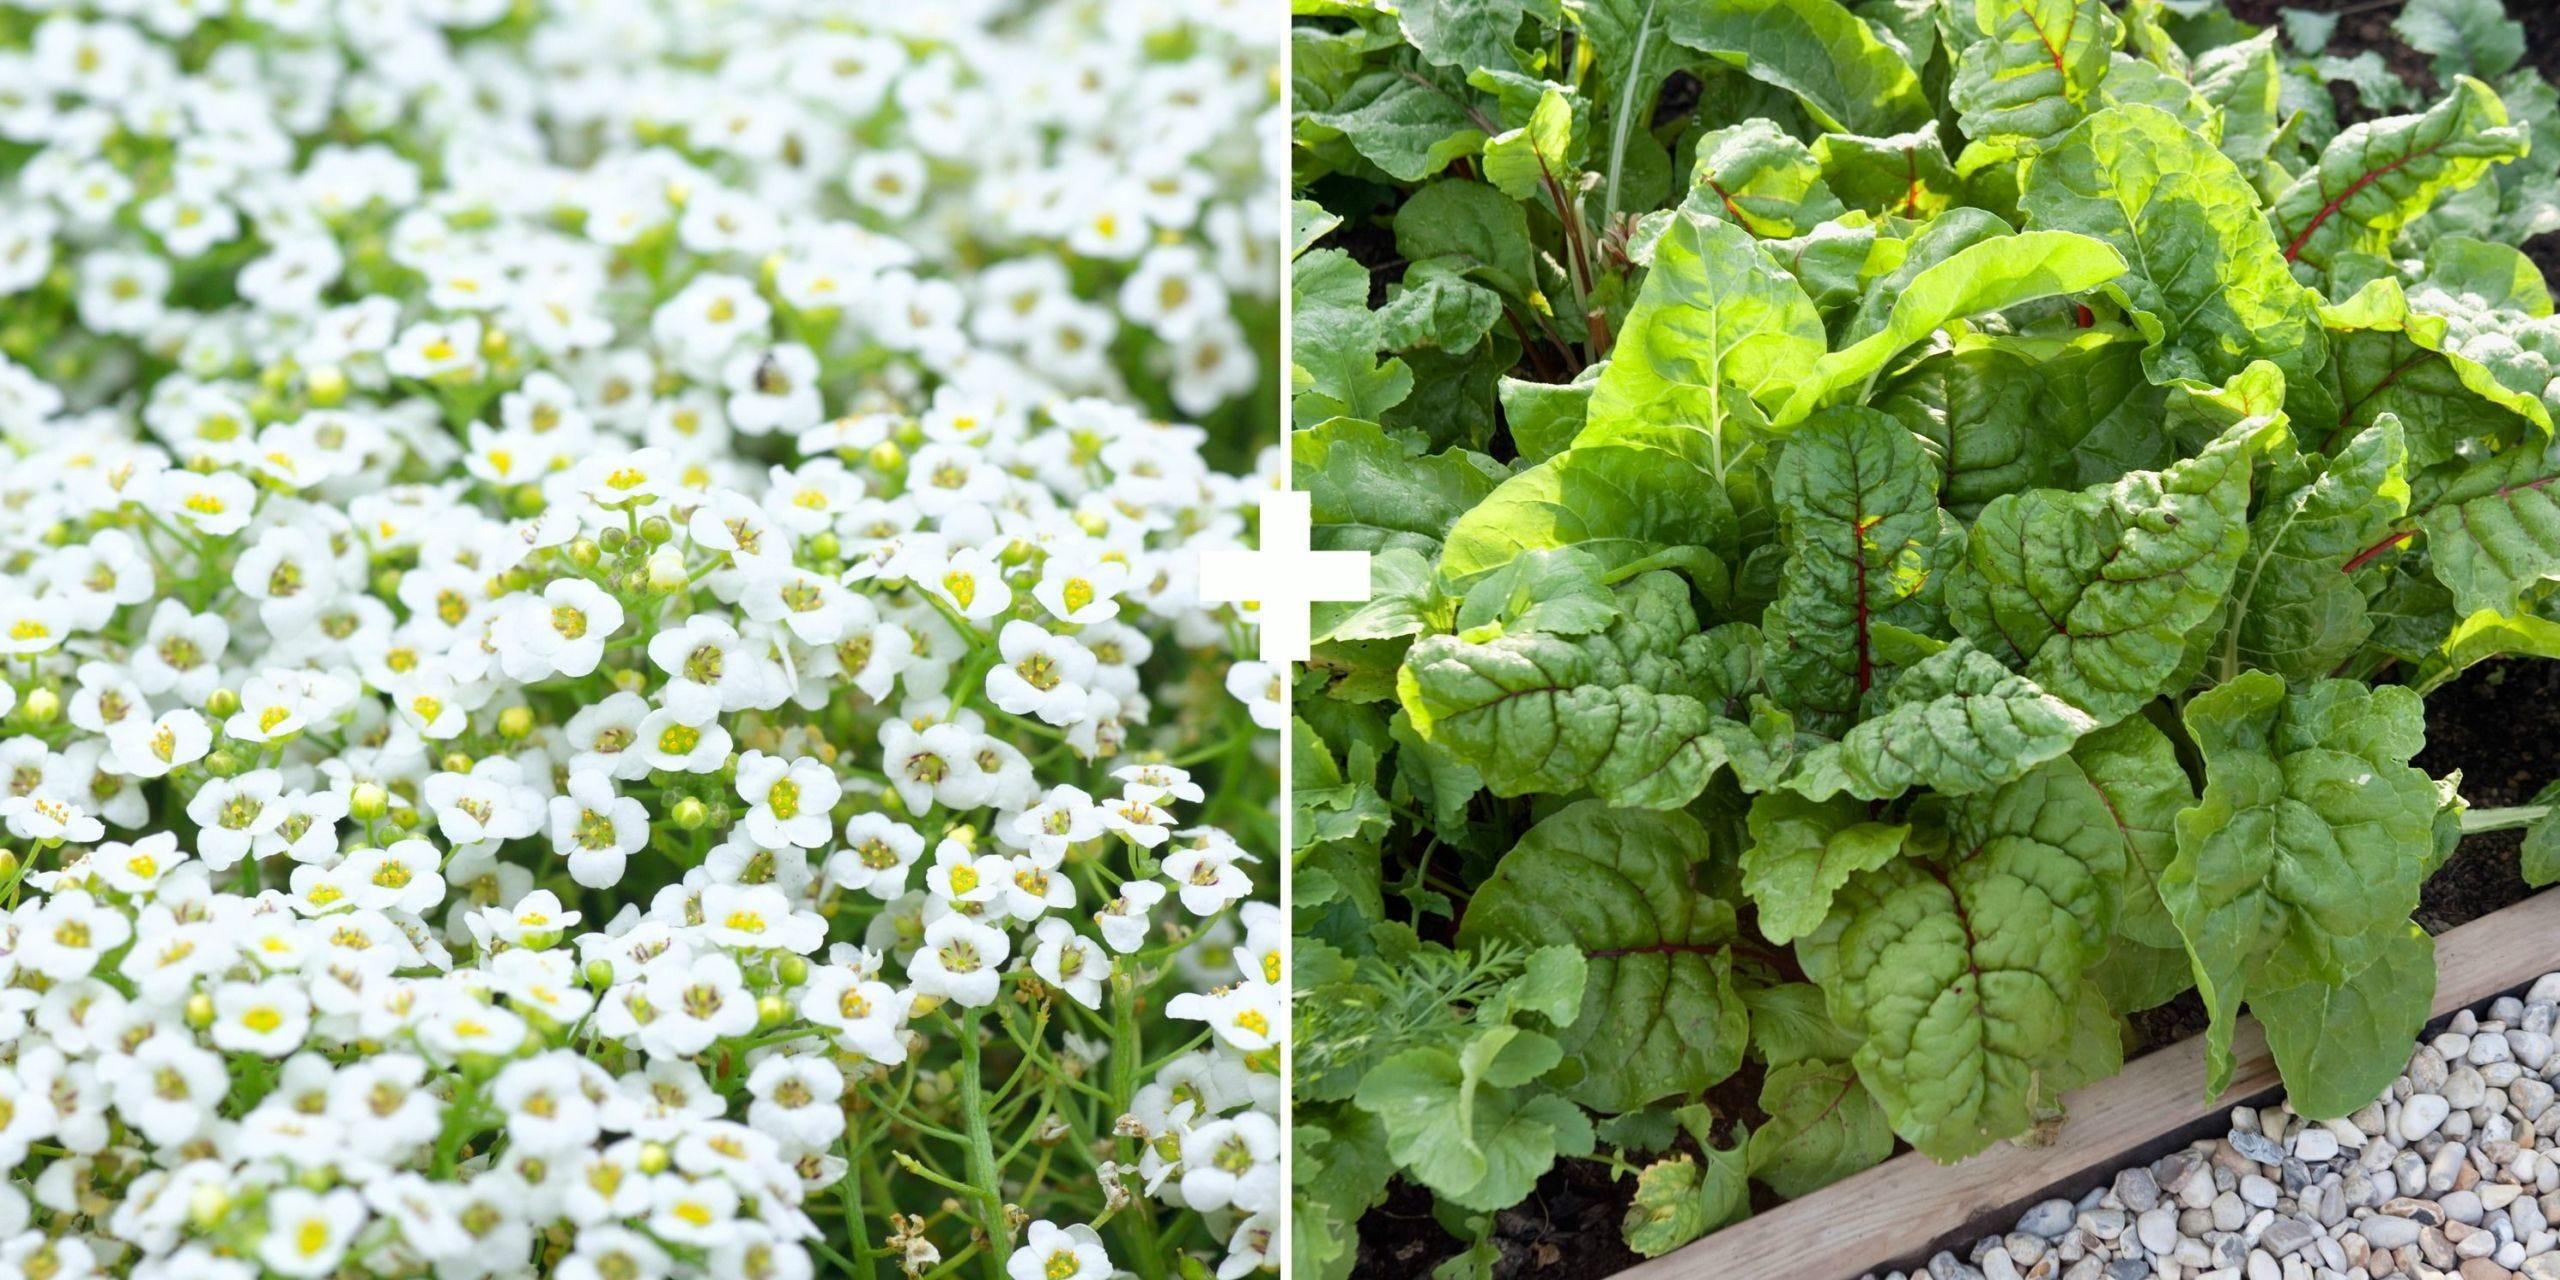 Flower, Plant, Flowering plant, Leaf, Herb, Groundcover, Leaf vegetable, Food, Vegetable, Annual plant,